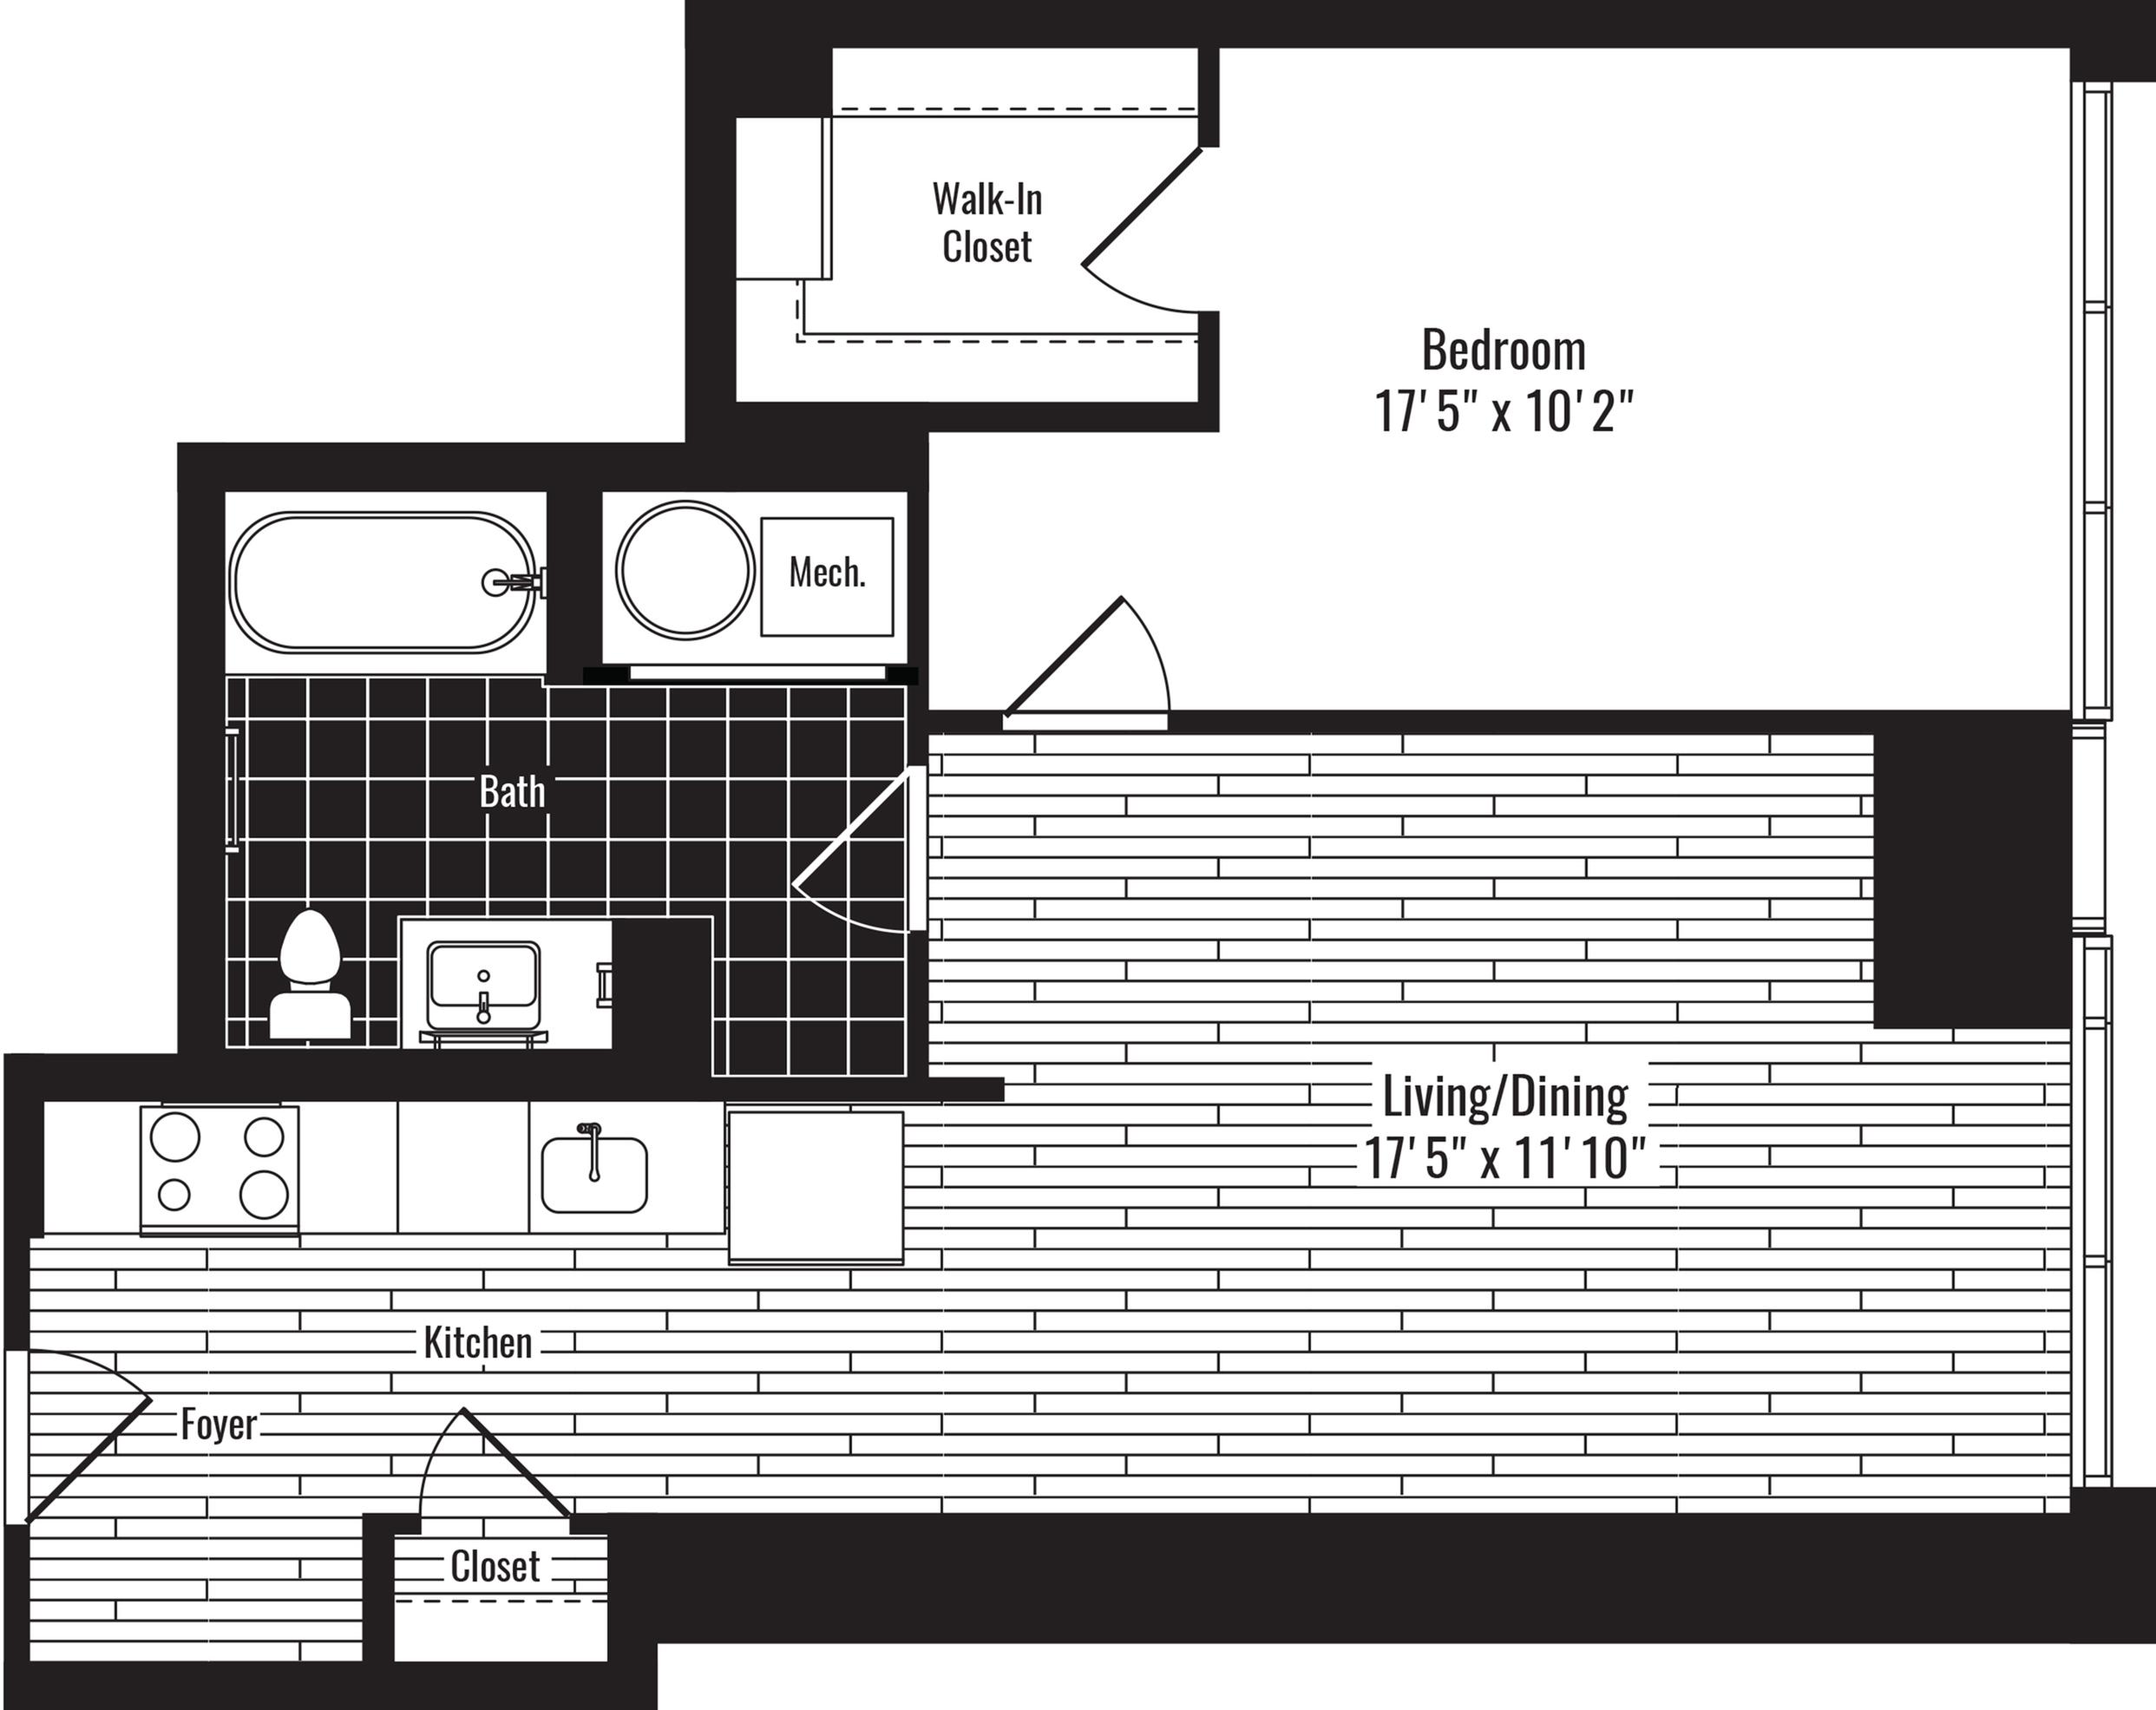 683 square foot one bedroom one bath apartment floorplan image